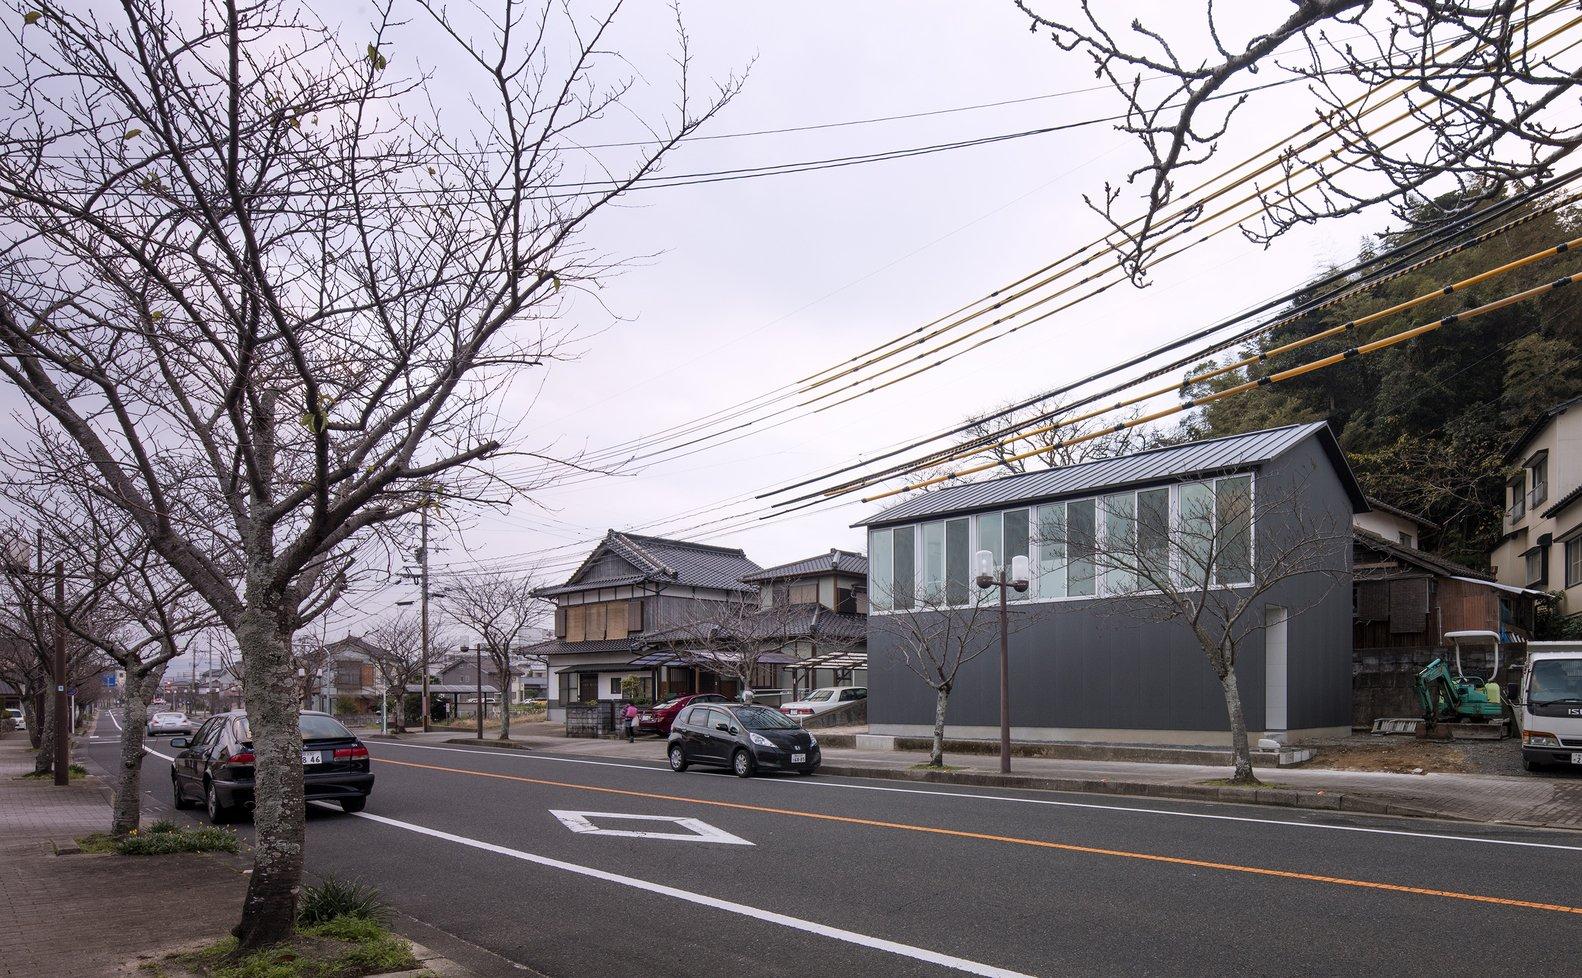 Photo 5 of 7 in House in Futako by Yabashi Architects & Associates